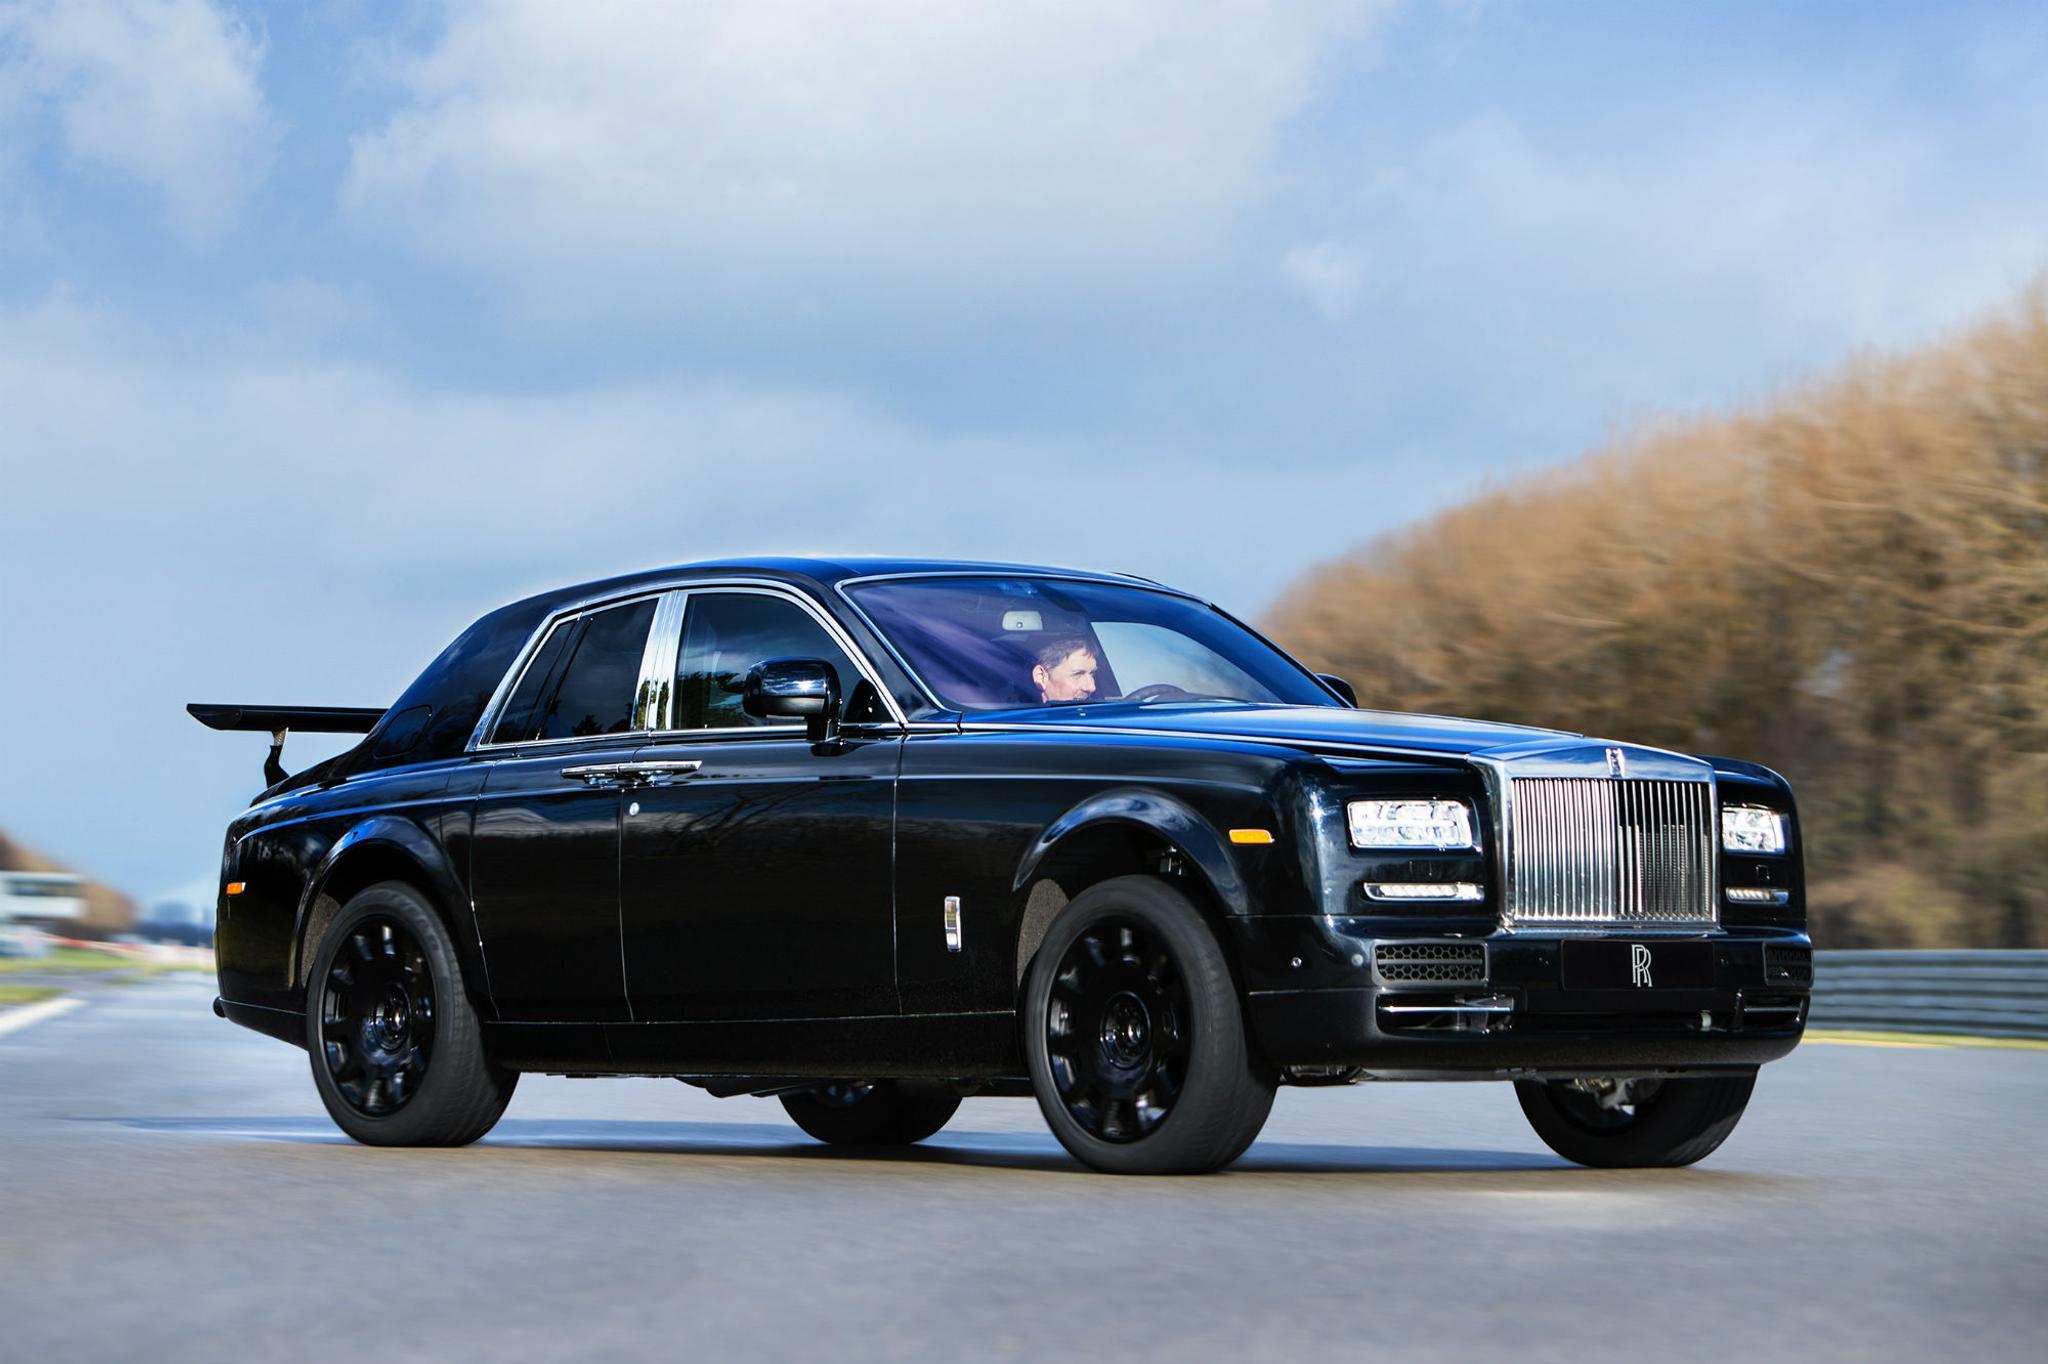 Rolls Royce Car >> Mita Ihmetta Rolls Royce Phantom Jossa On Takasiipi